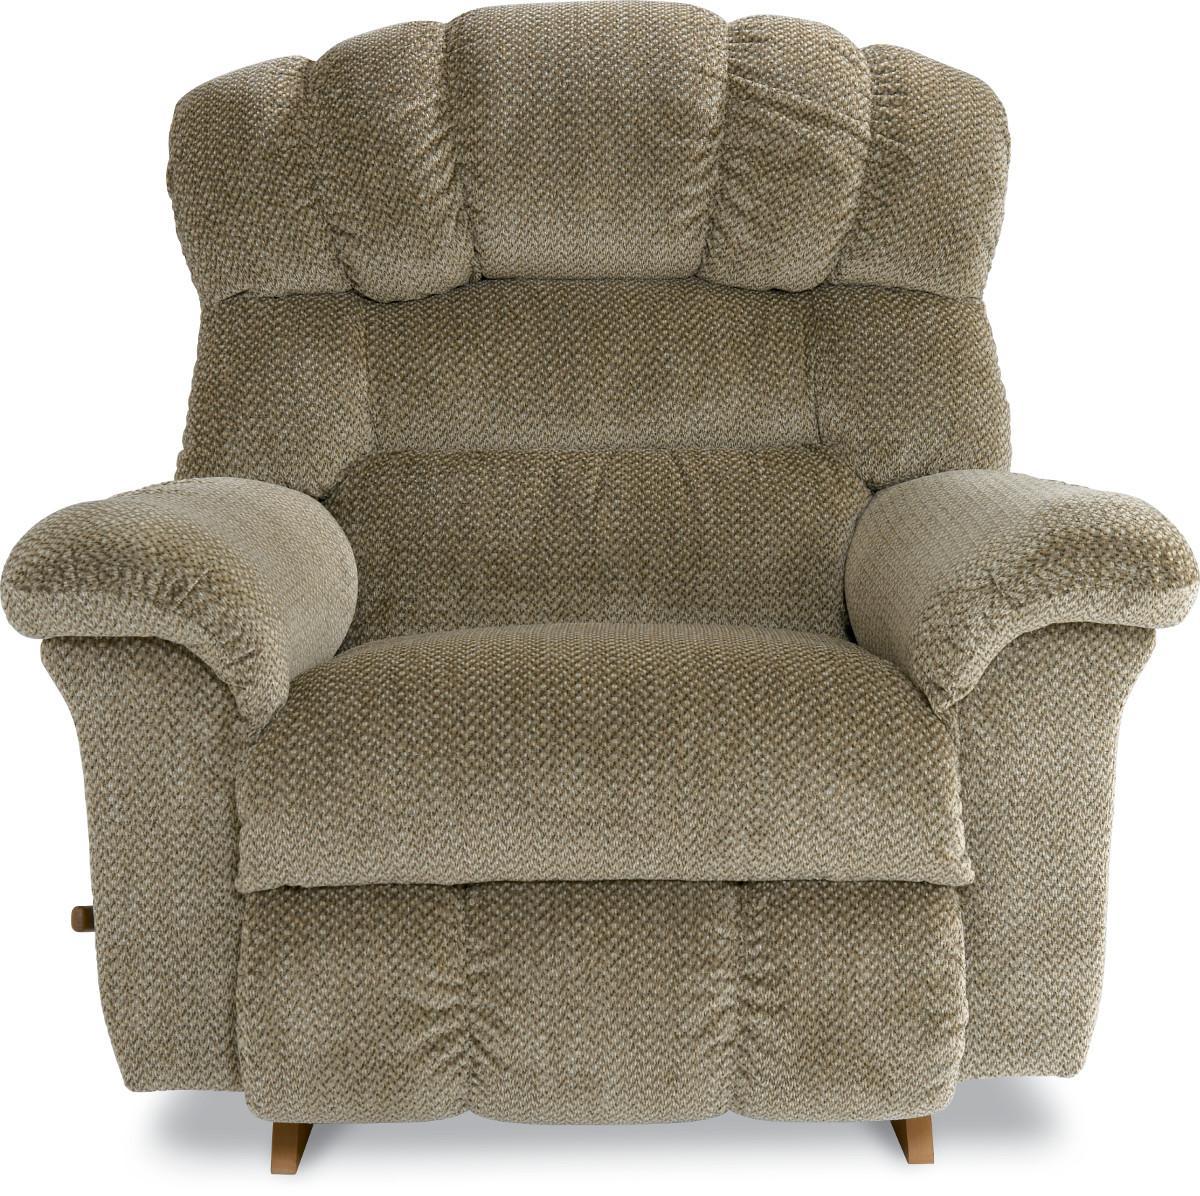 La Z Boy Crandell Reclina Rocker? Reclining Chair | Walkeru0027s Furniture |  Three Way Recliners Spokane, Kennewick, Tri Cities, Wenatchee, Coeur  Du0027Alene, ...